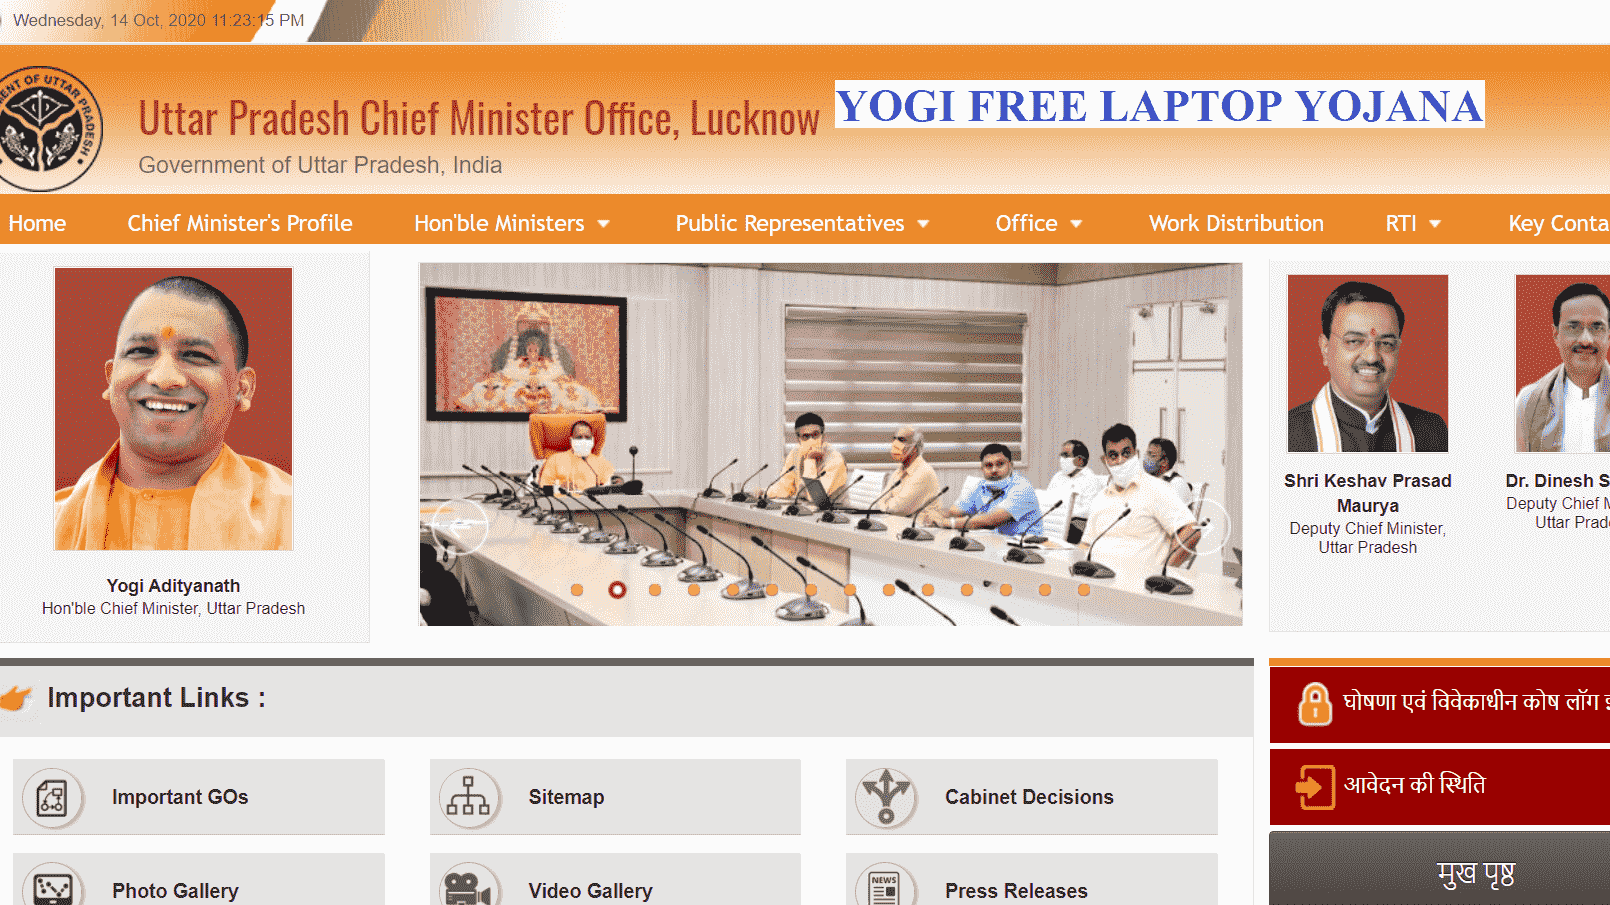 Yogi Laptop Yojana (2020)   यूपी फ्री लैपटॉप योजना 2020 ऑनलाइन आवेदन करें  